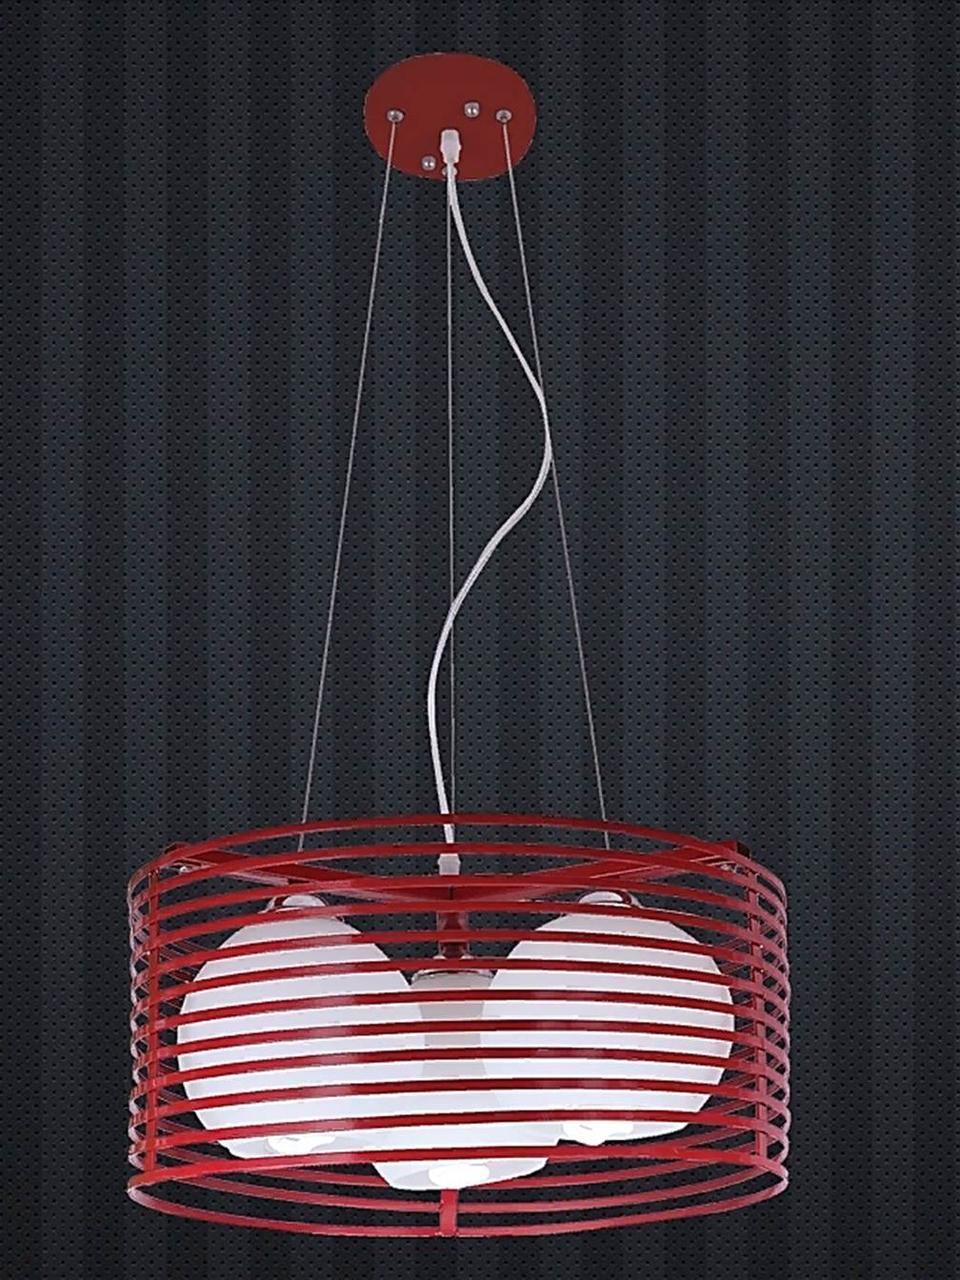 Люстра подвесная в стиле Loft на три плафона красная LV 7079800-3